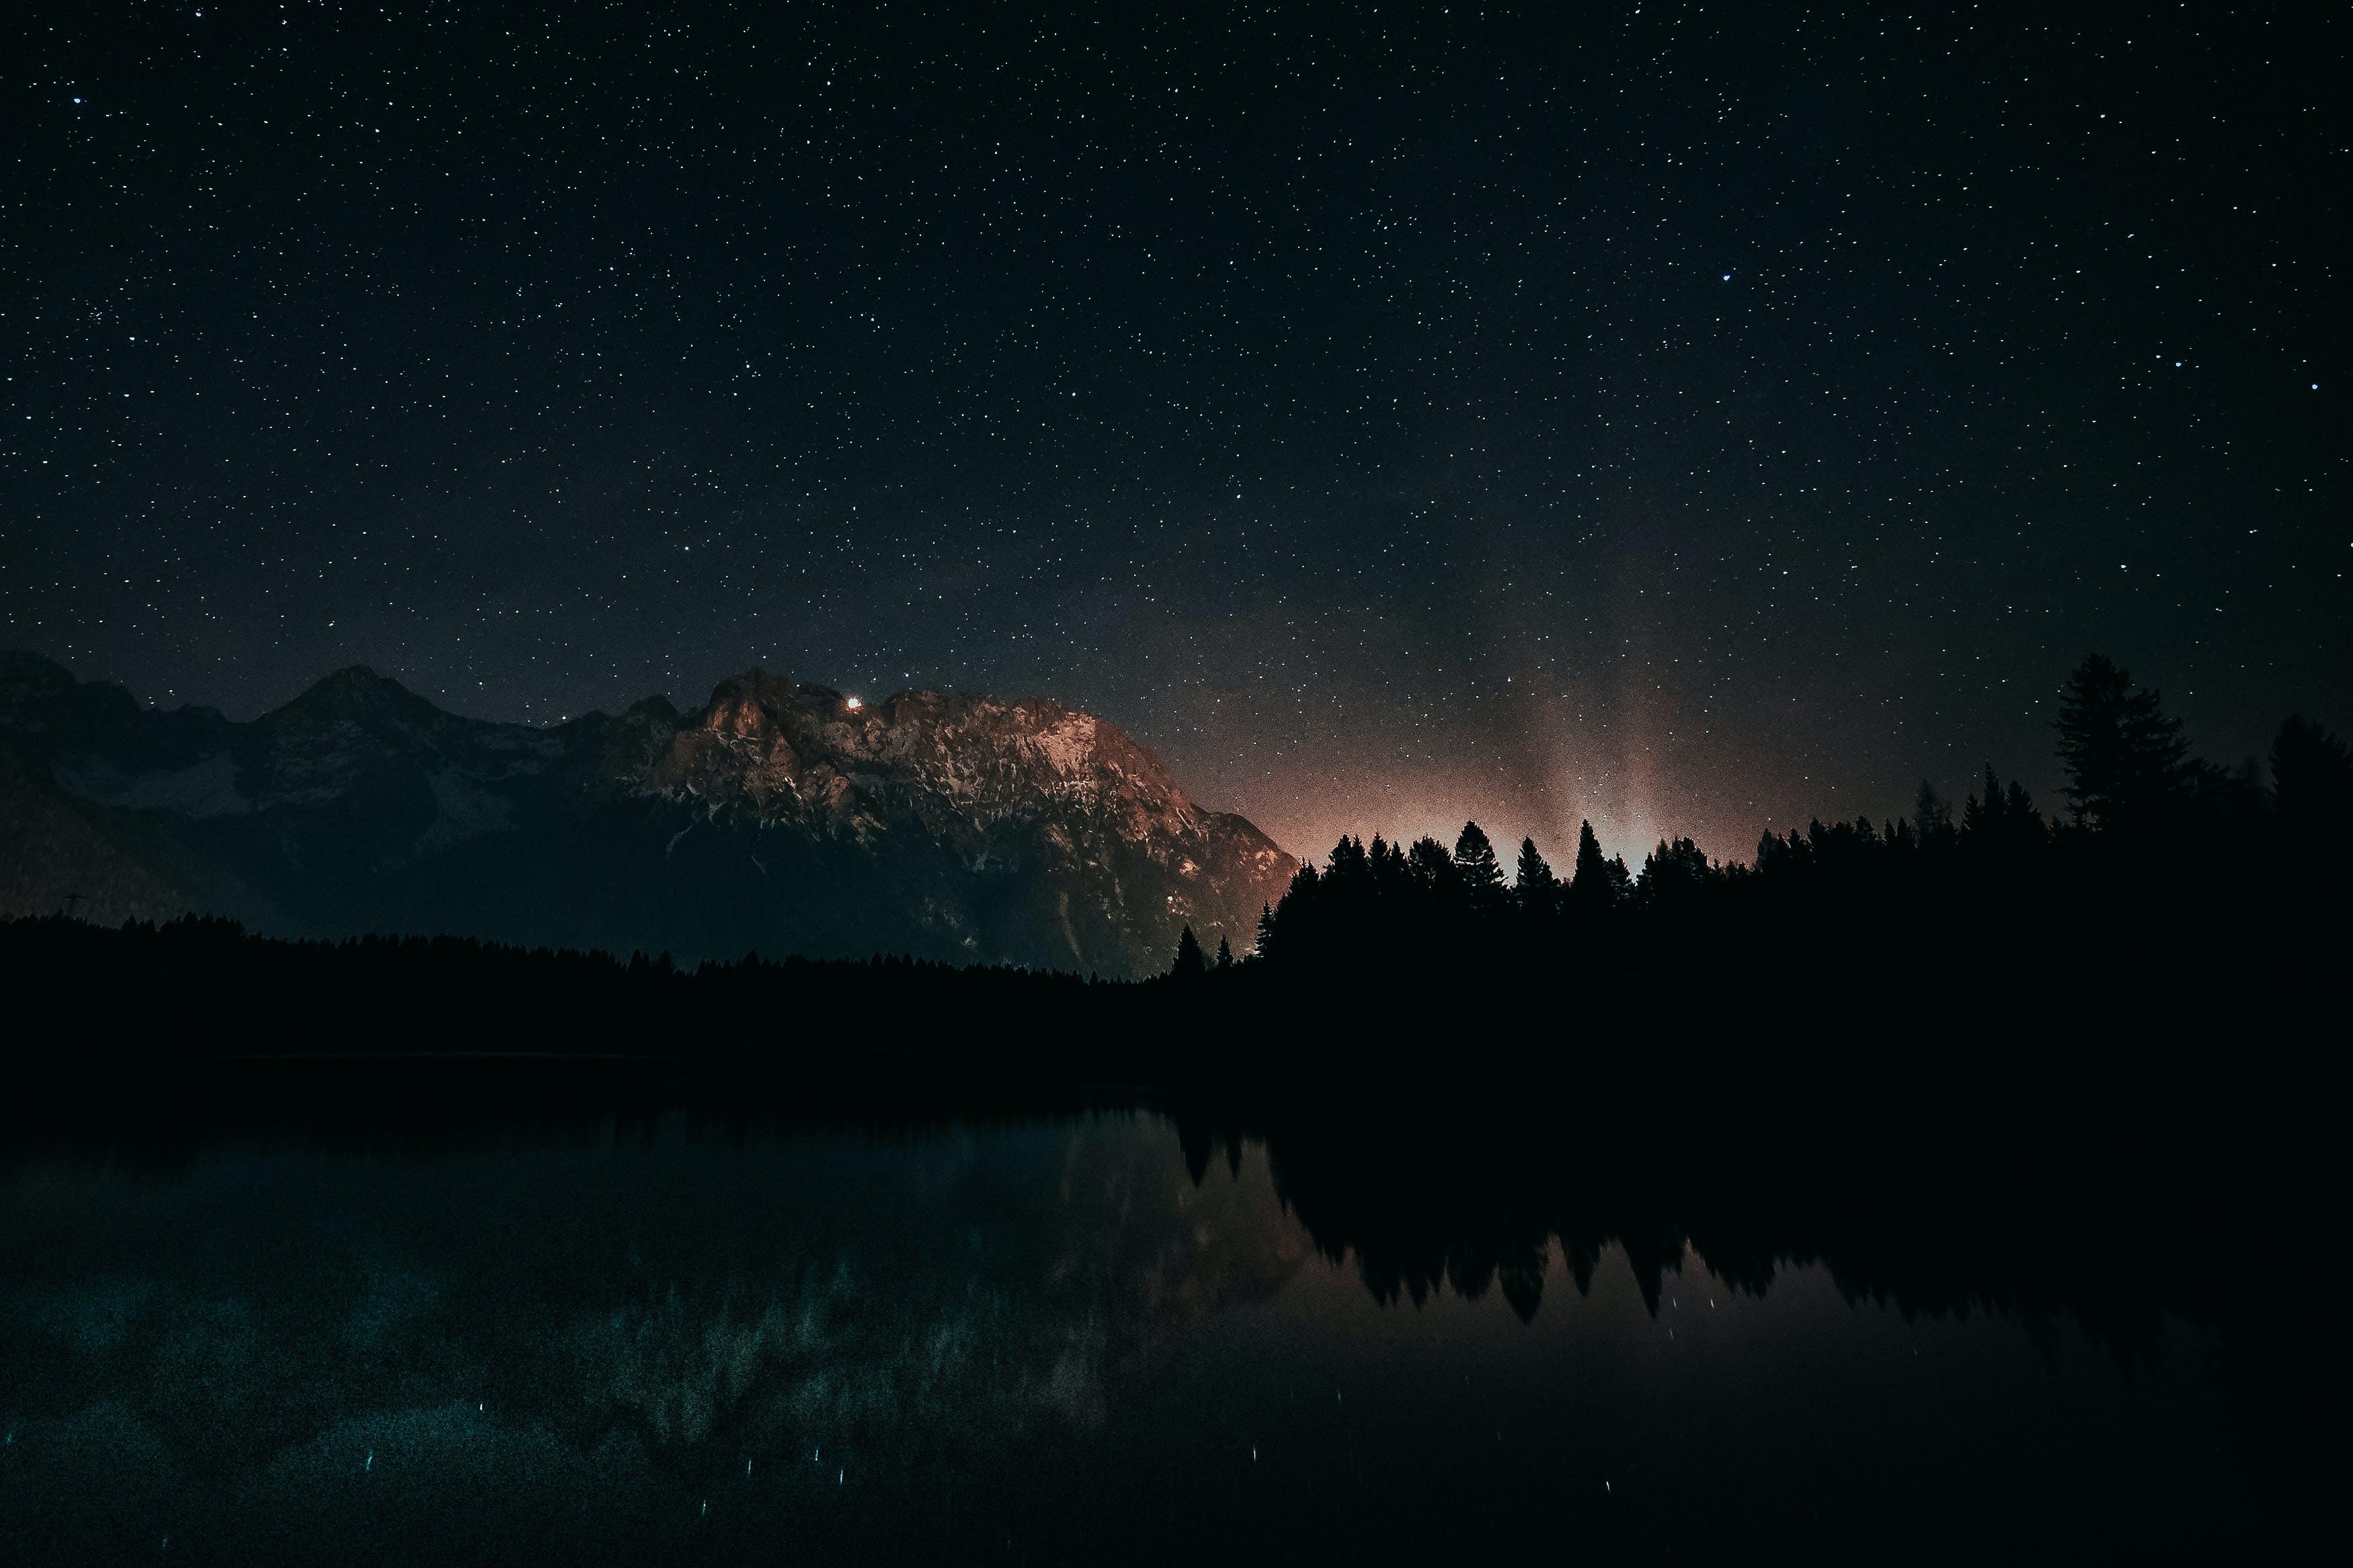 Kostenloses Stock Foto zu abend, astronomie, bäume, berge